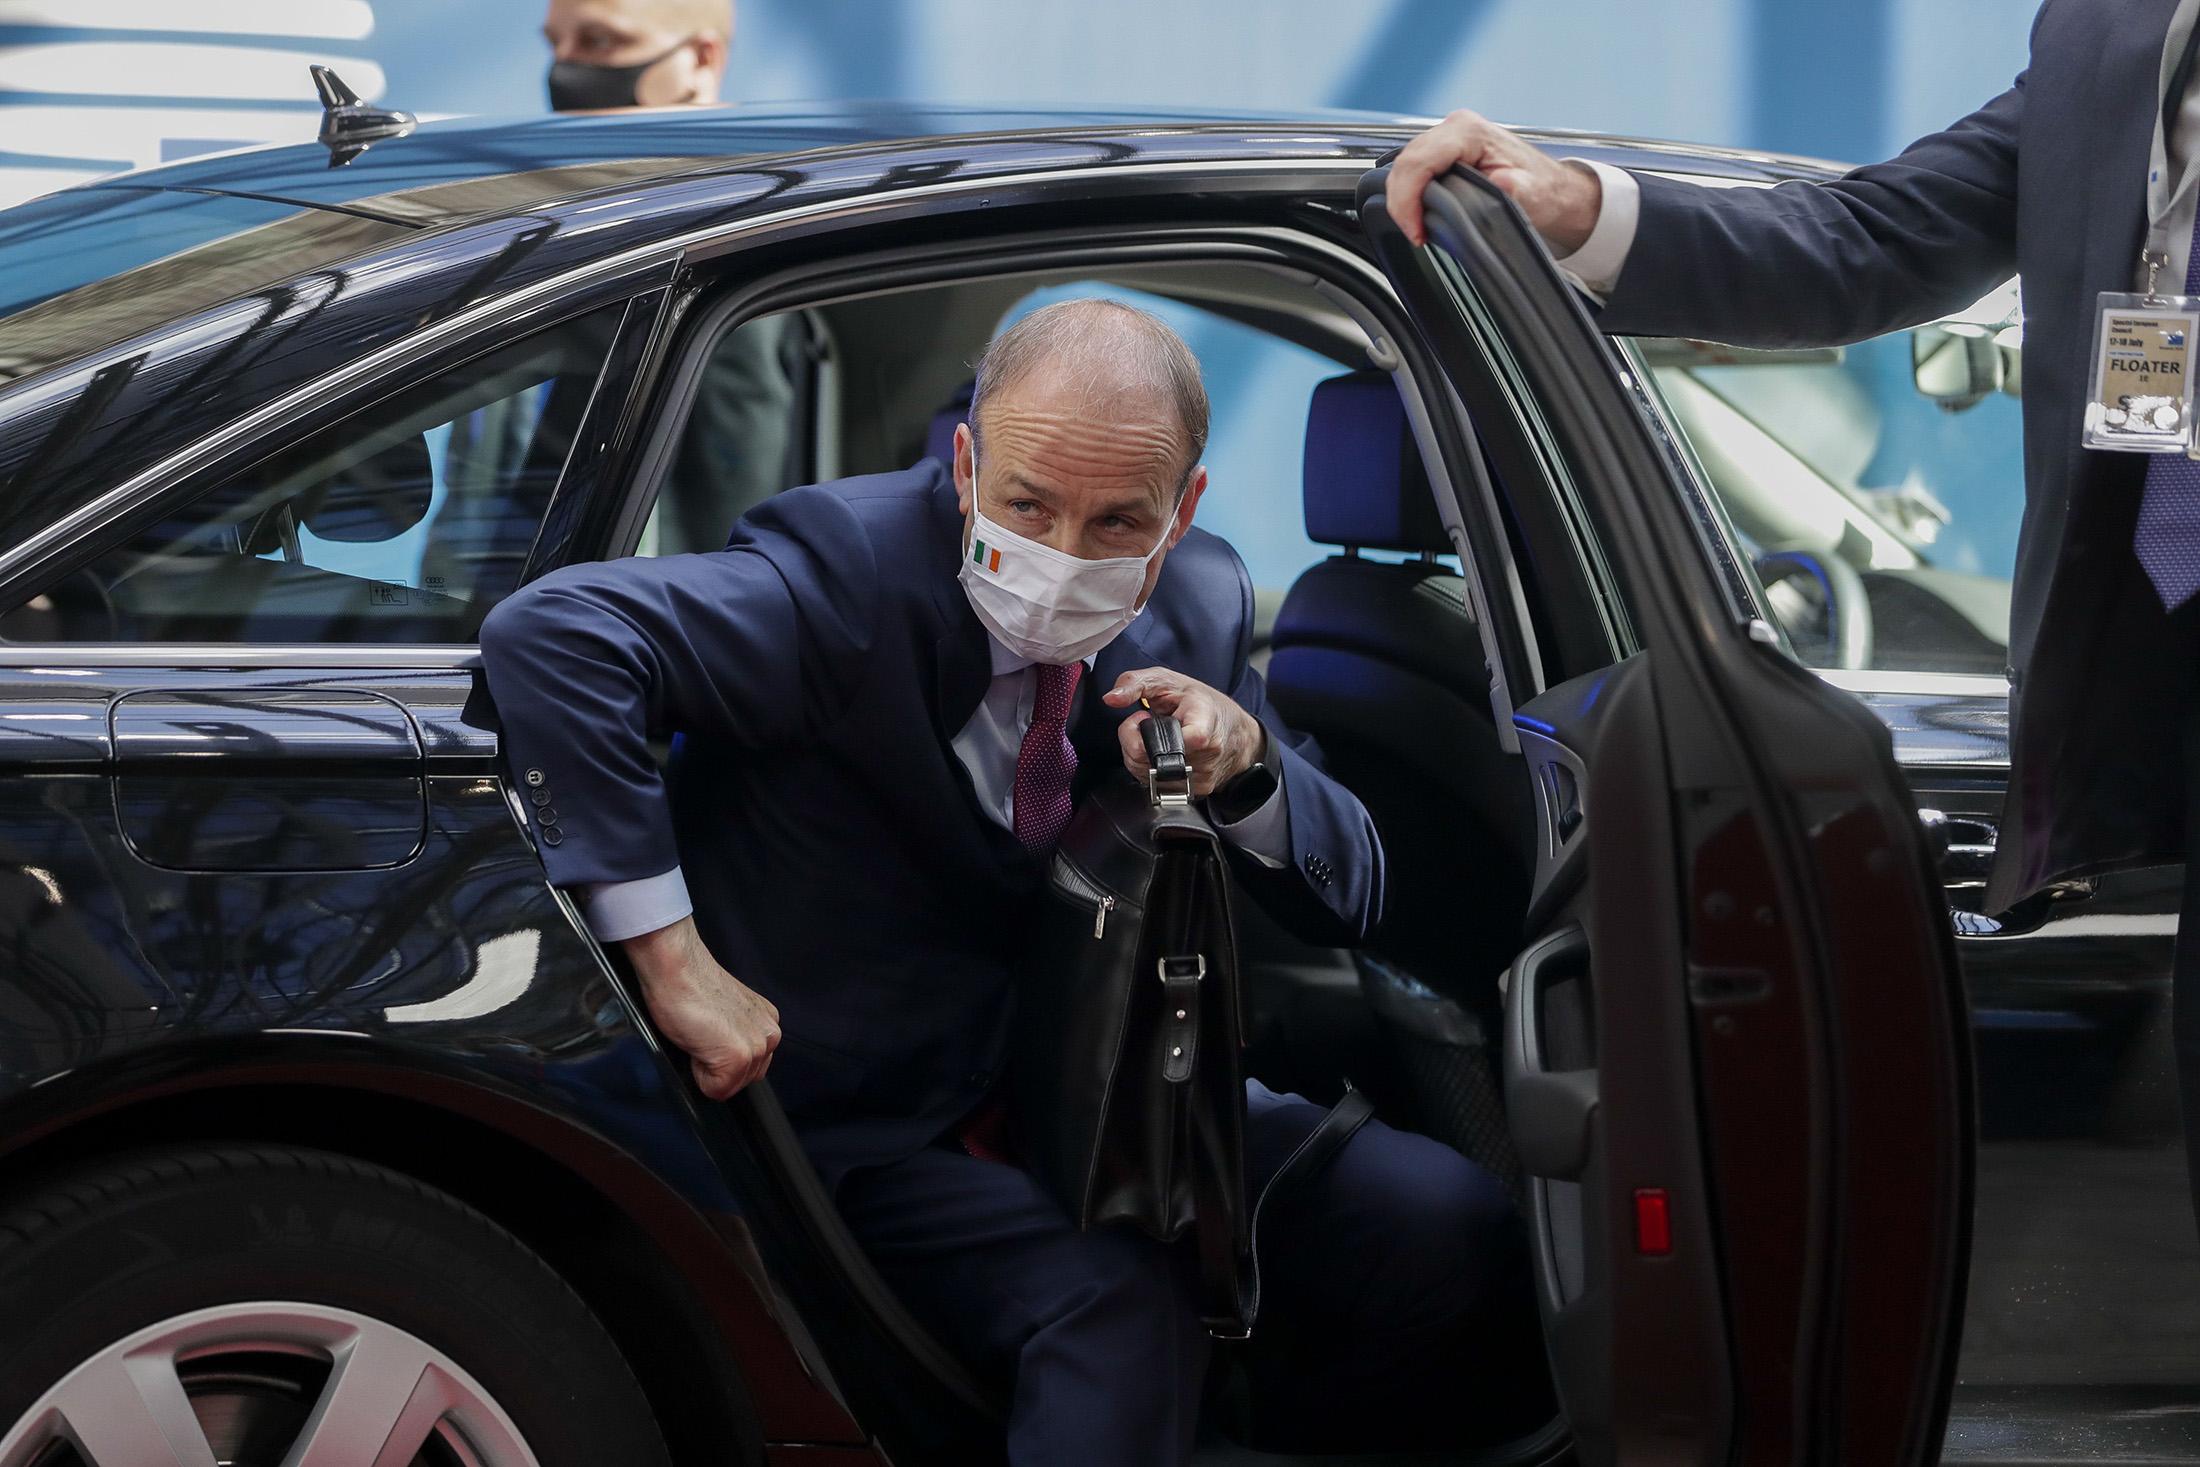 Irish PM to recall parliament as virus scandal grows